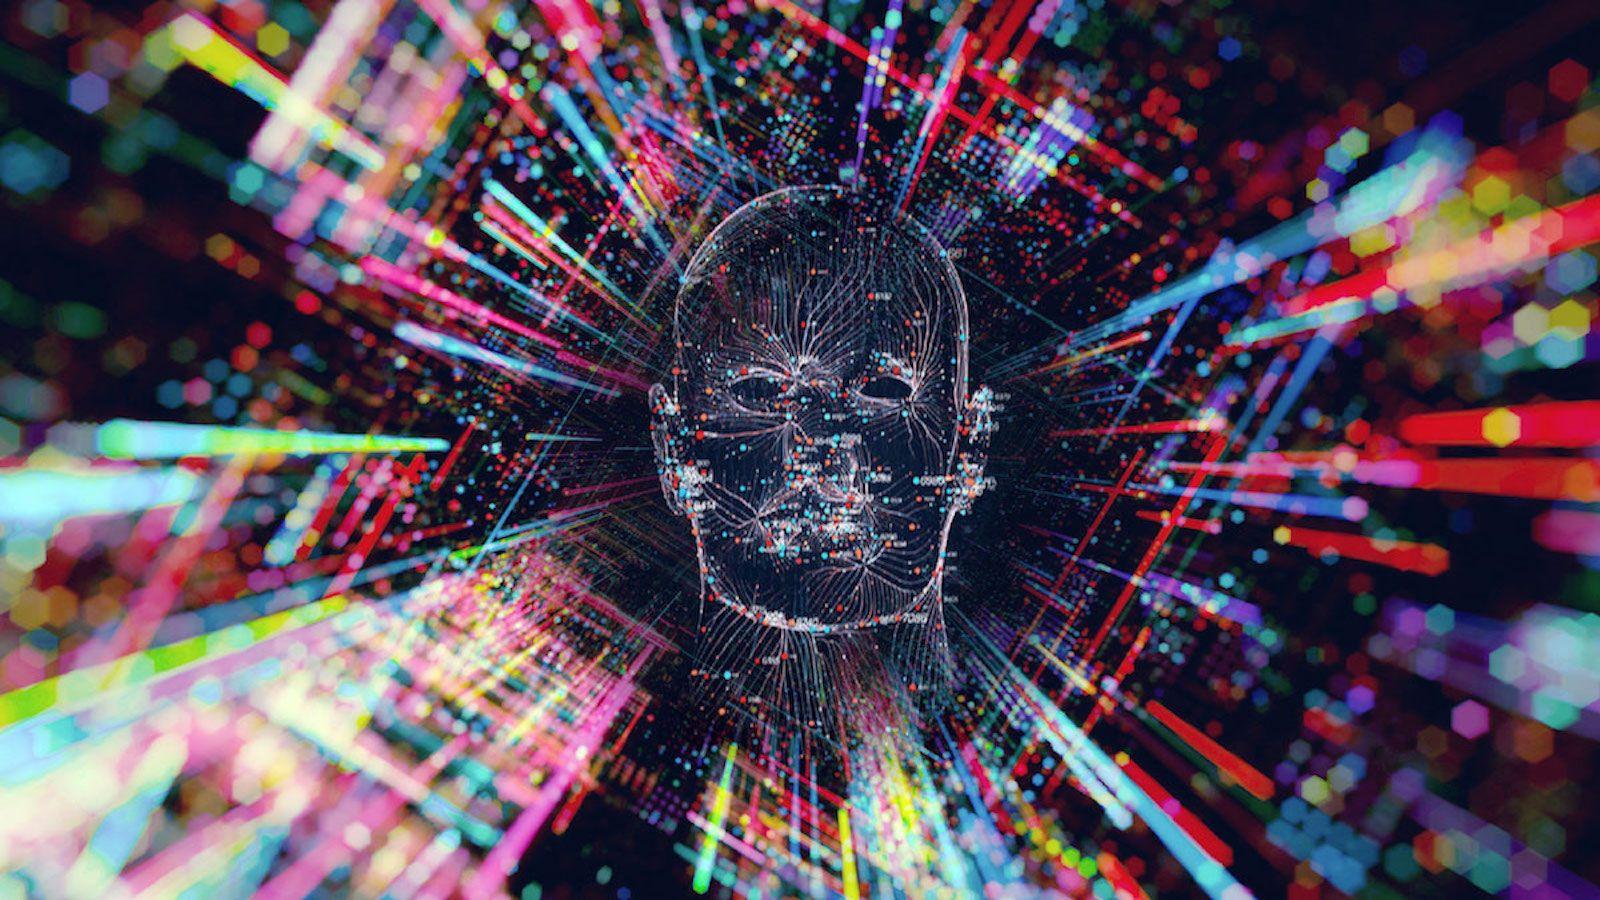 digital person's face